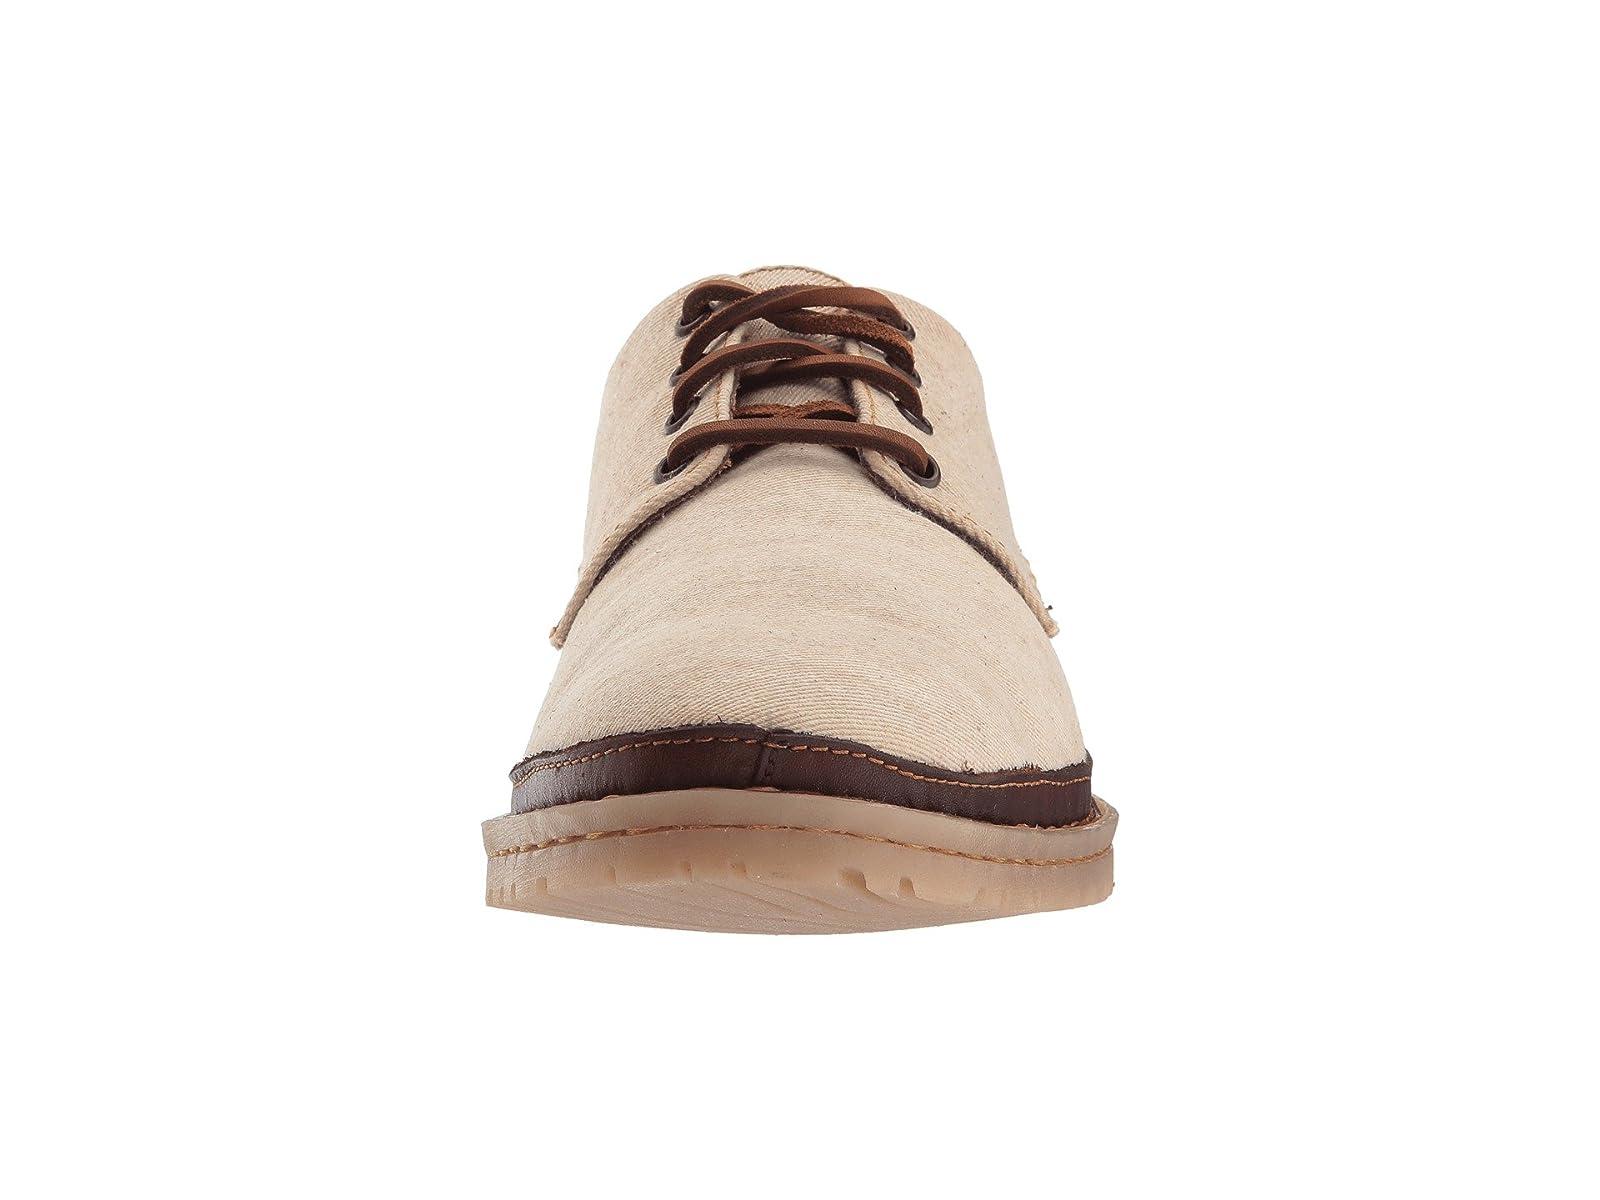 sports shoes 5783b cc683 ... Man Woman:Born Gilles : : : Good goods collection 7a9e70